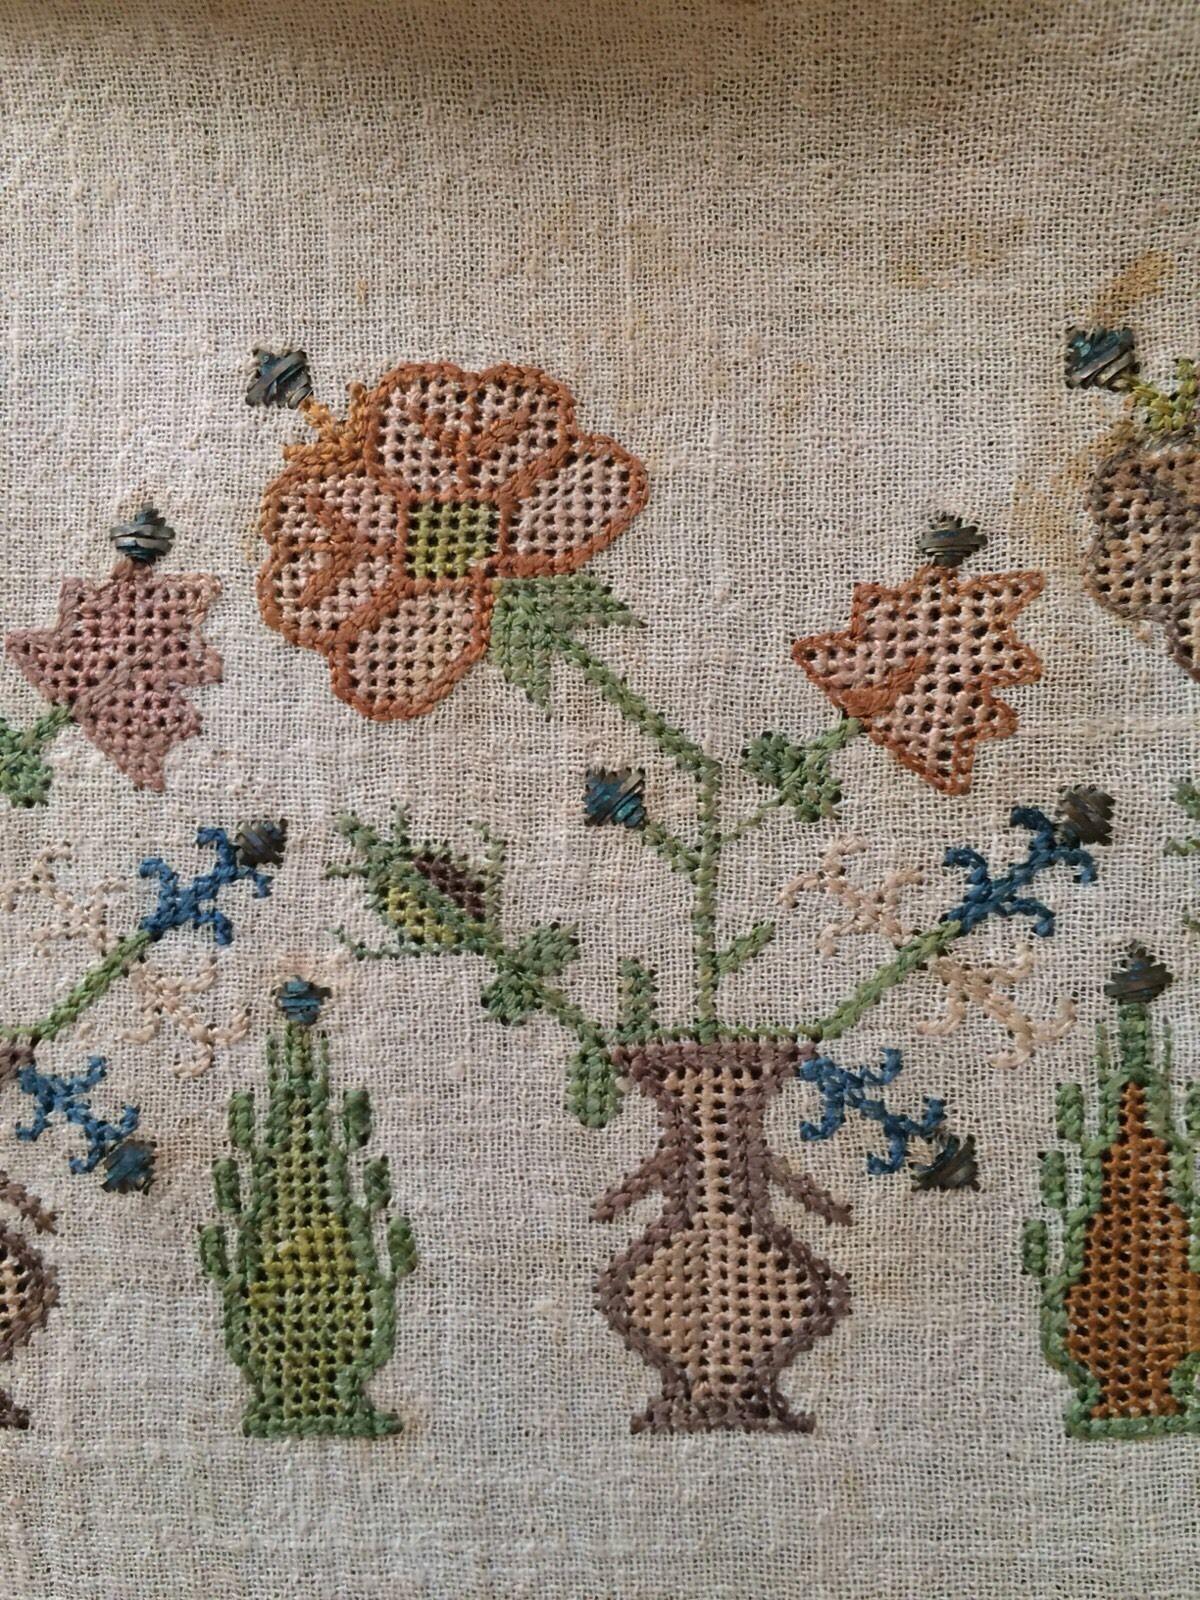 19th C Antique Ottoman Turkish Hand Embroidery On Linen Sash